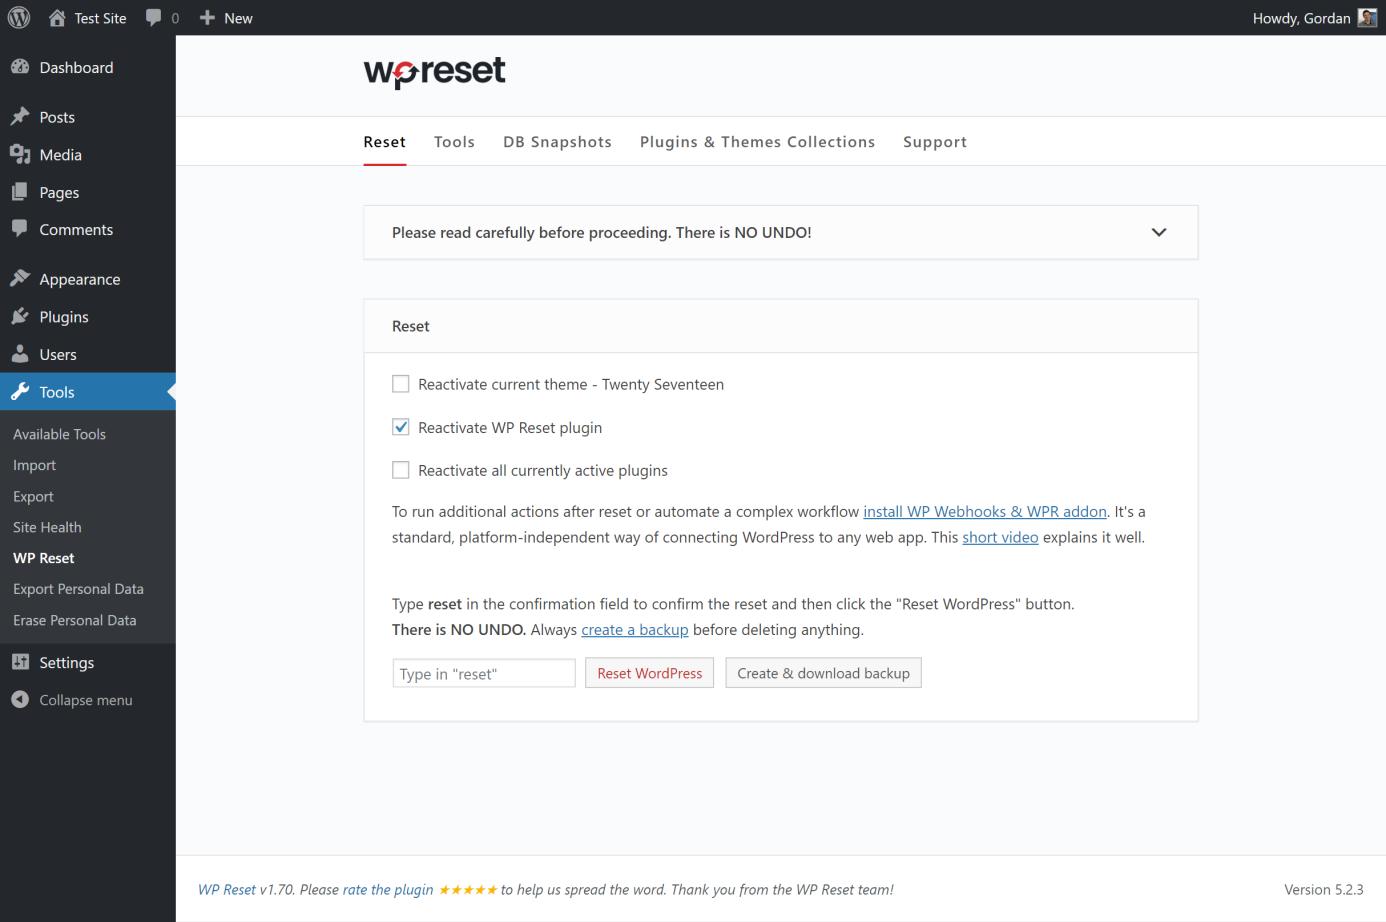 reseting website with wpreset 1